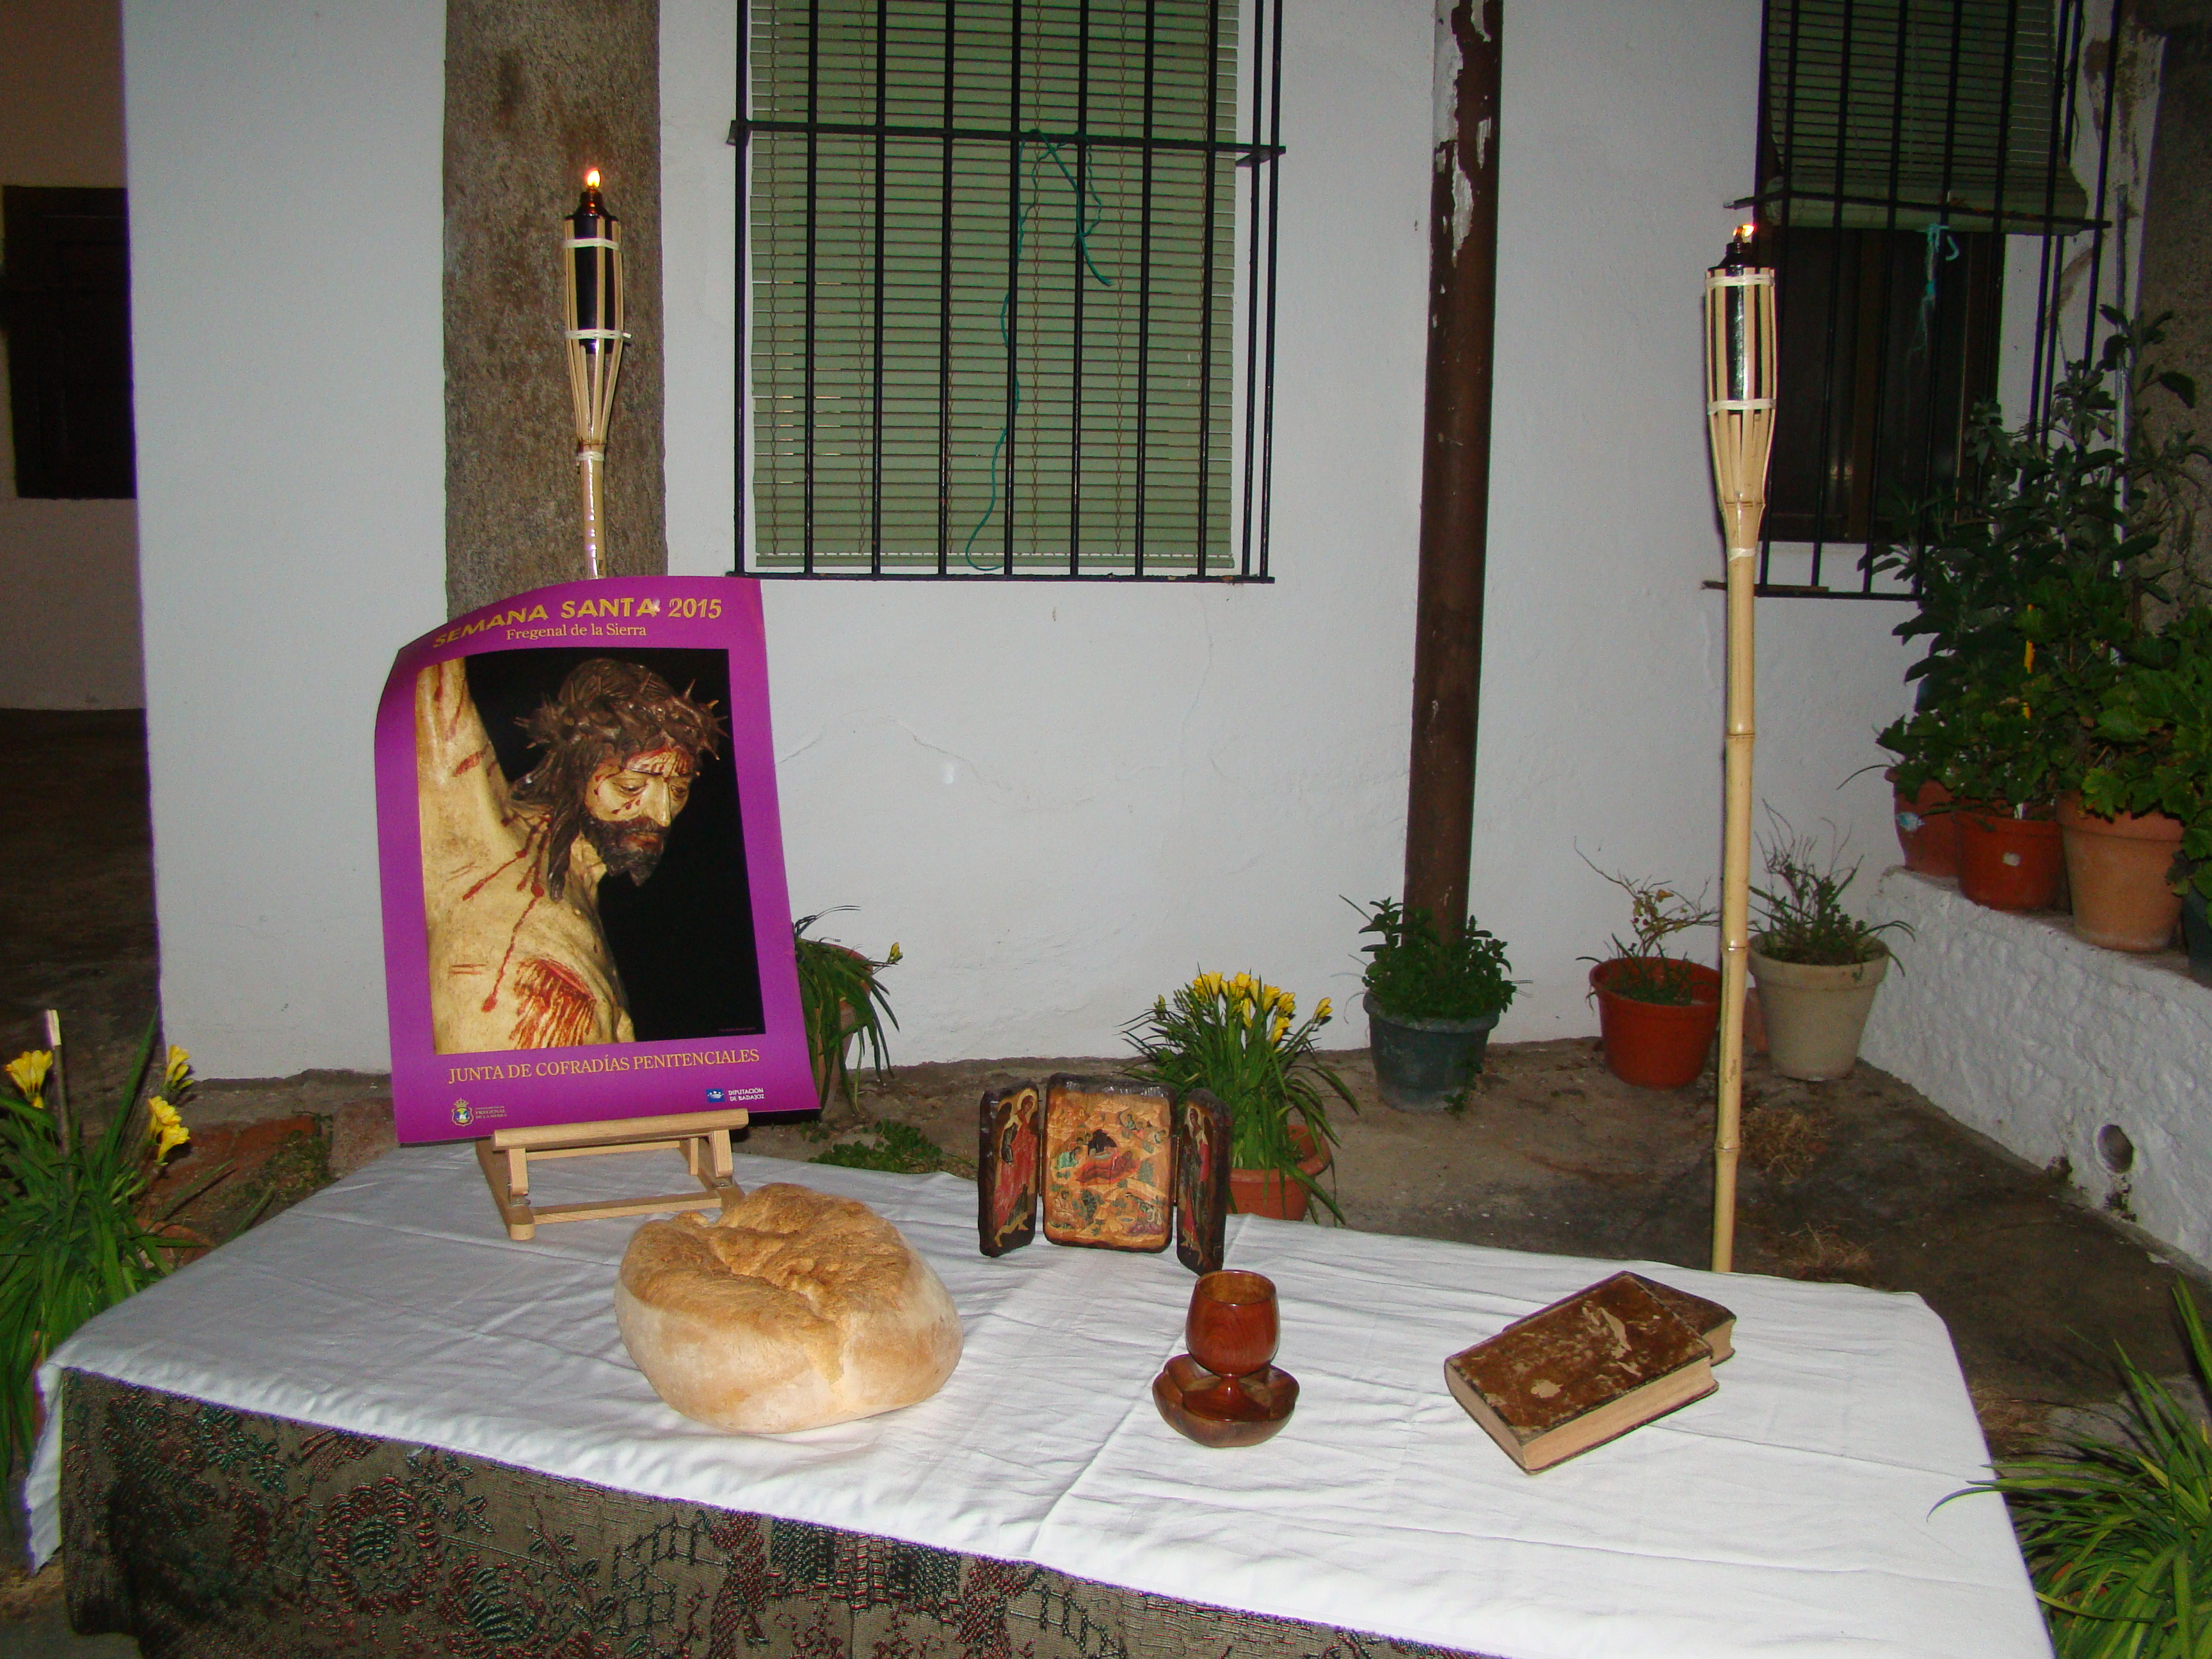 SEMANA SANTA 2015 FREGENAL DE LA SIERRA